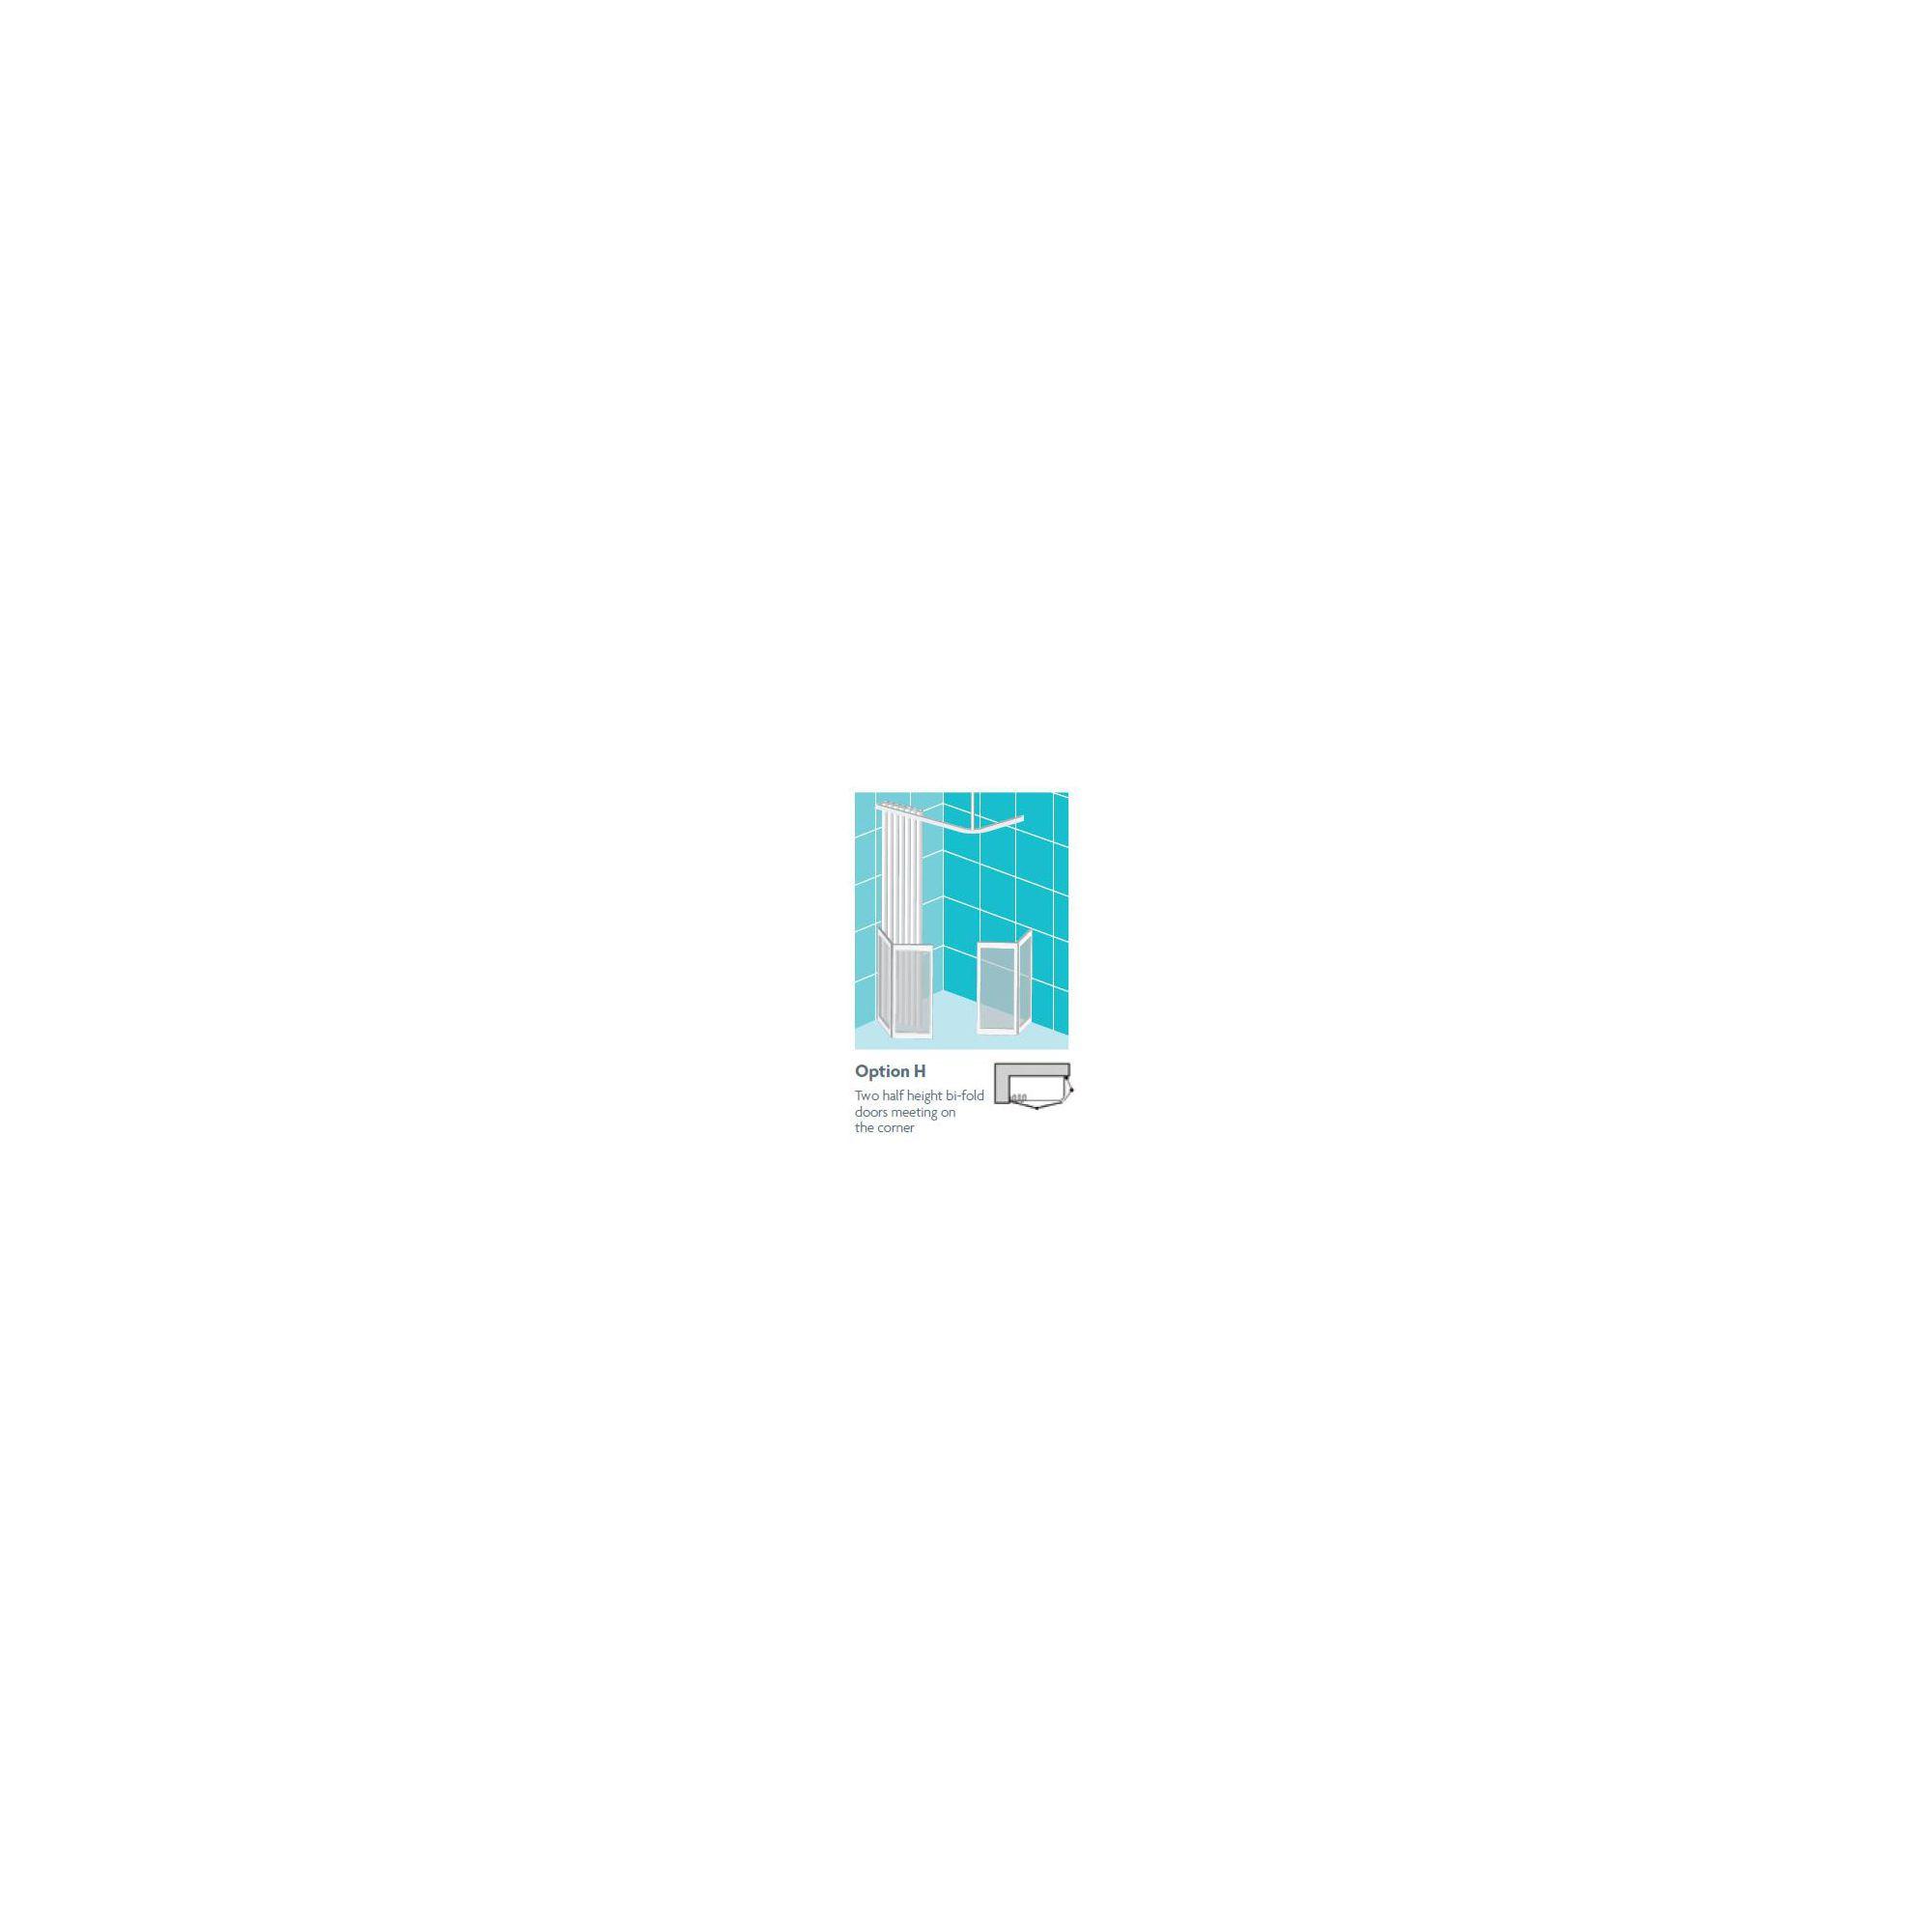 Impey Supreme Corner Door Option H 800mm x 800mm at Tesco Direct